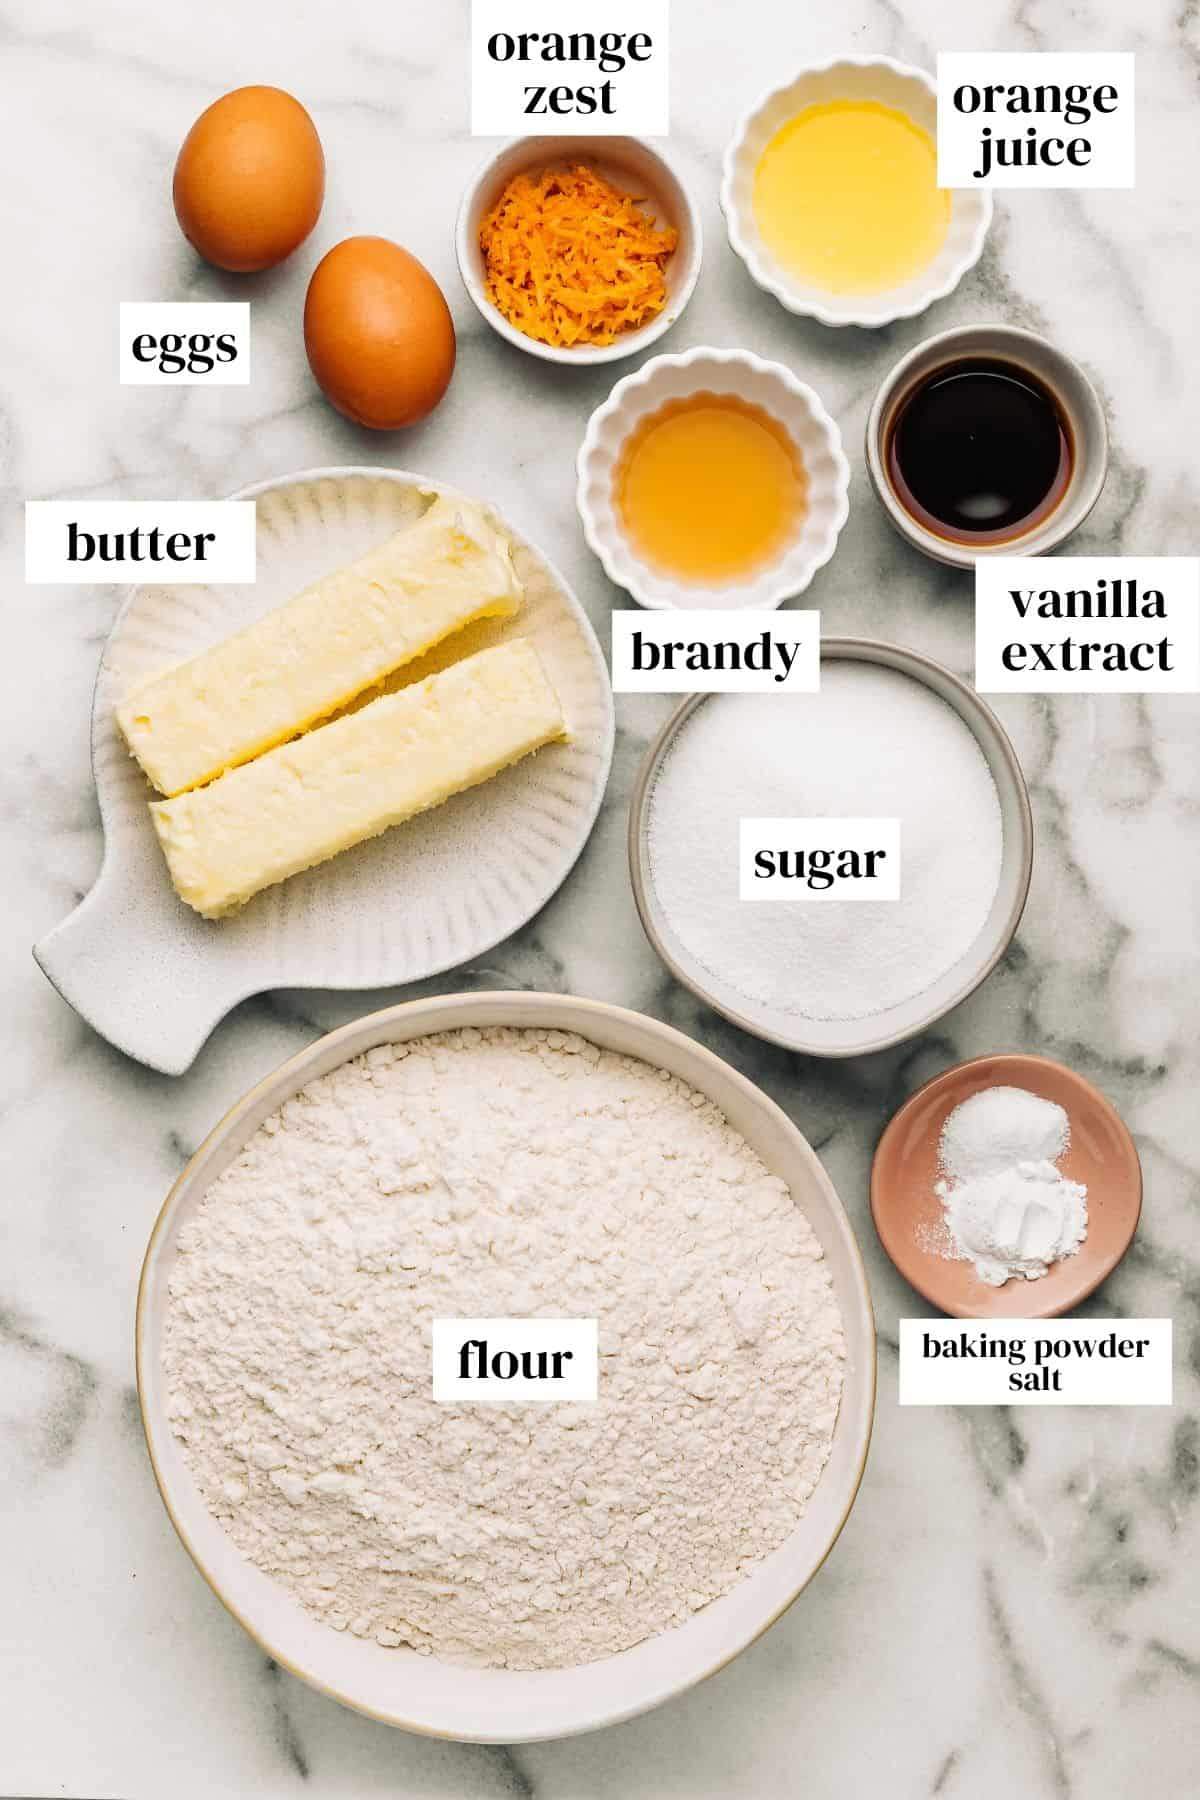 eggs, orange zest, orange juice, brandy, vanilla extract, sugar, butter, baking powder, salt, and flour on a marble surface.